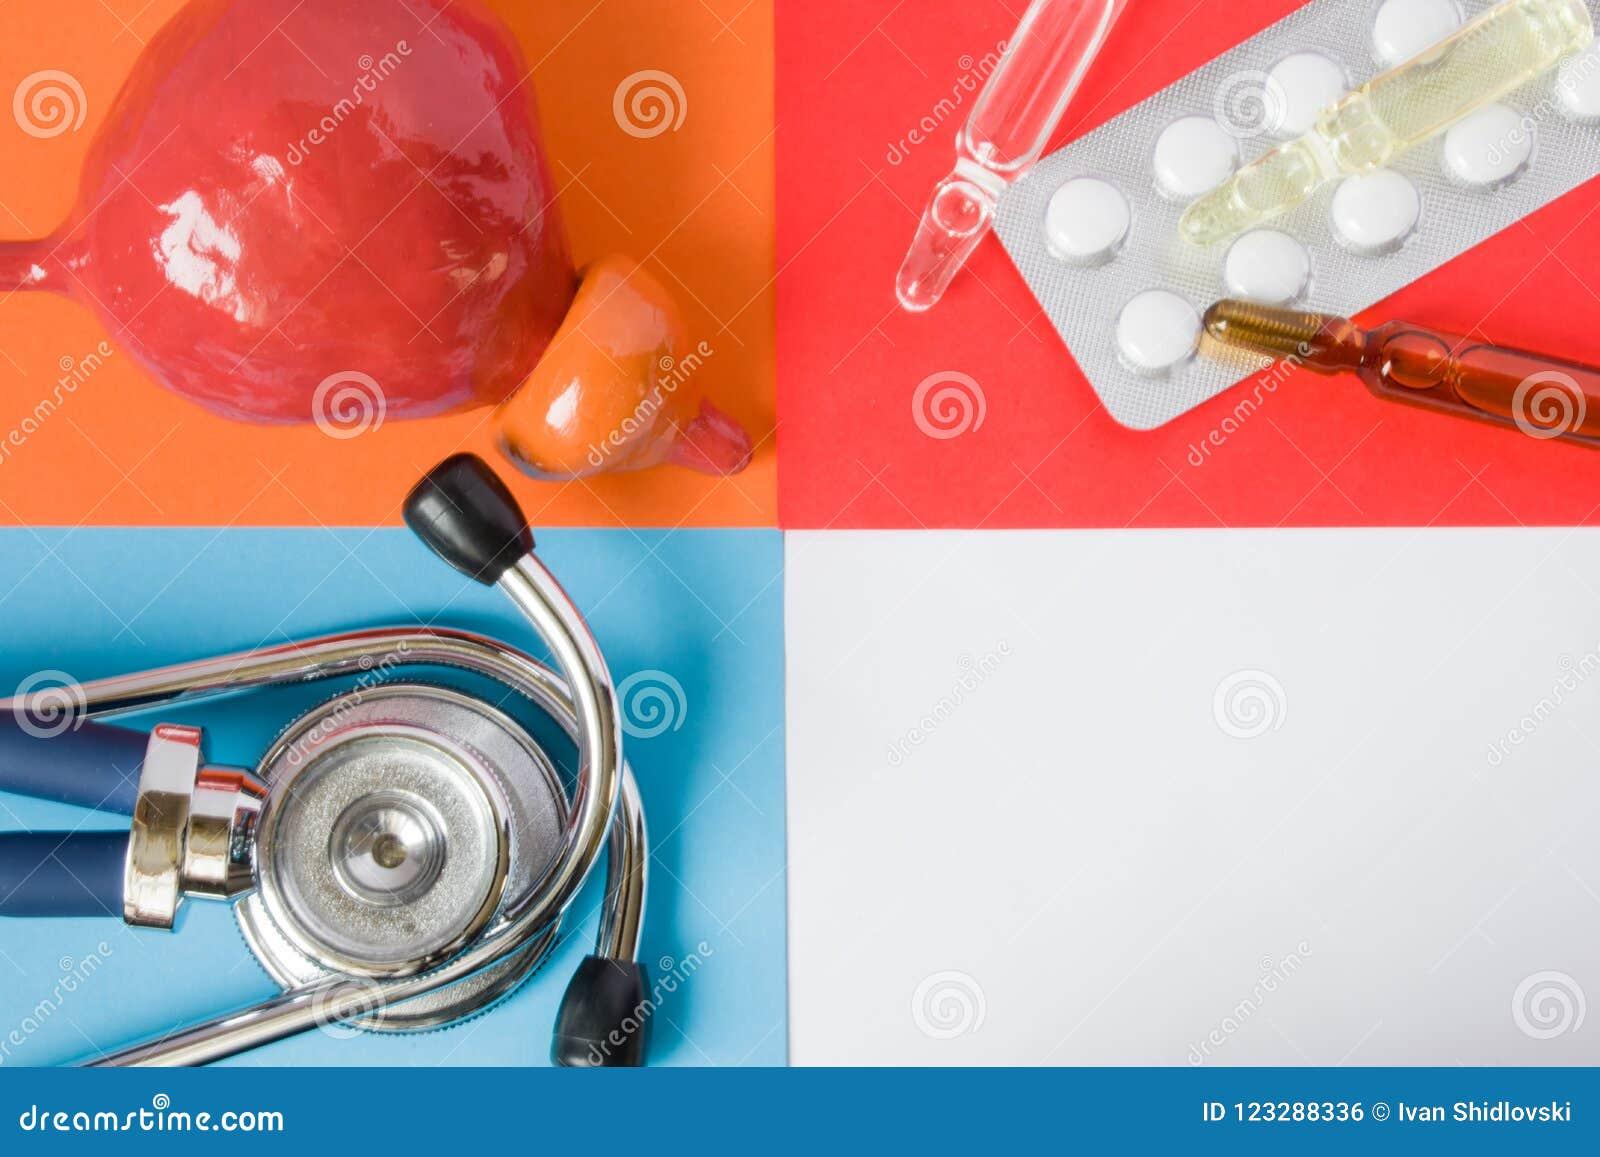 Простата медицинских или здравоохранения идеи проекта фото-органа, диагностический медицинский стетоскоп инструмента и пилюльки л